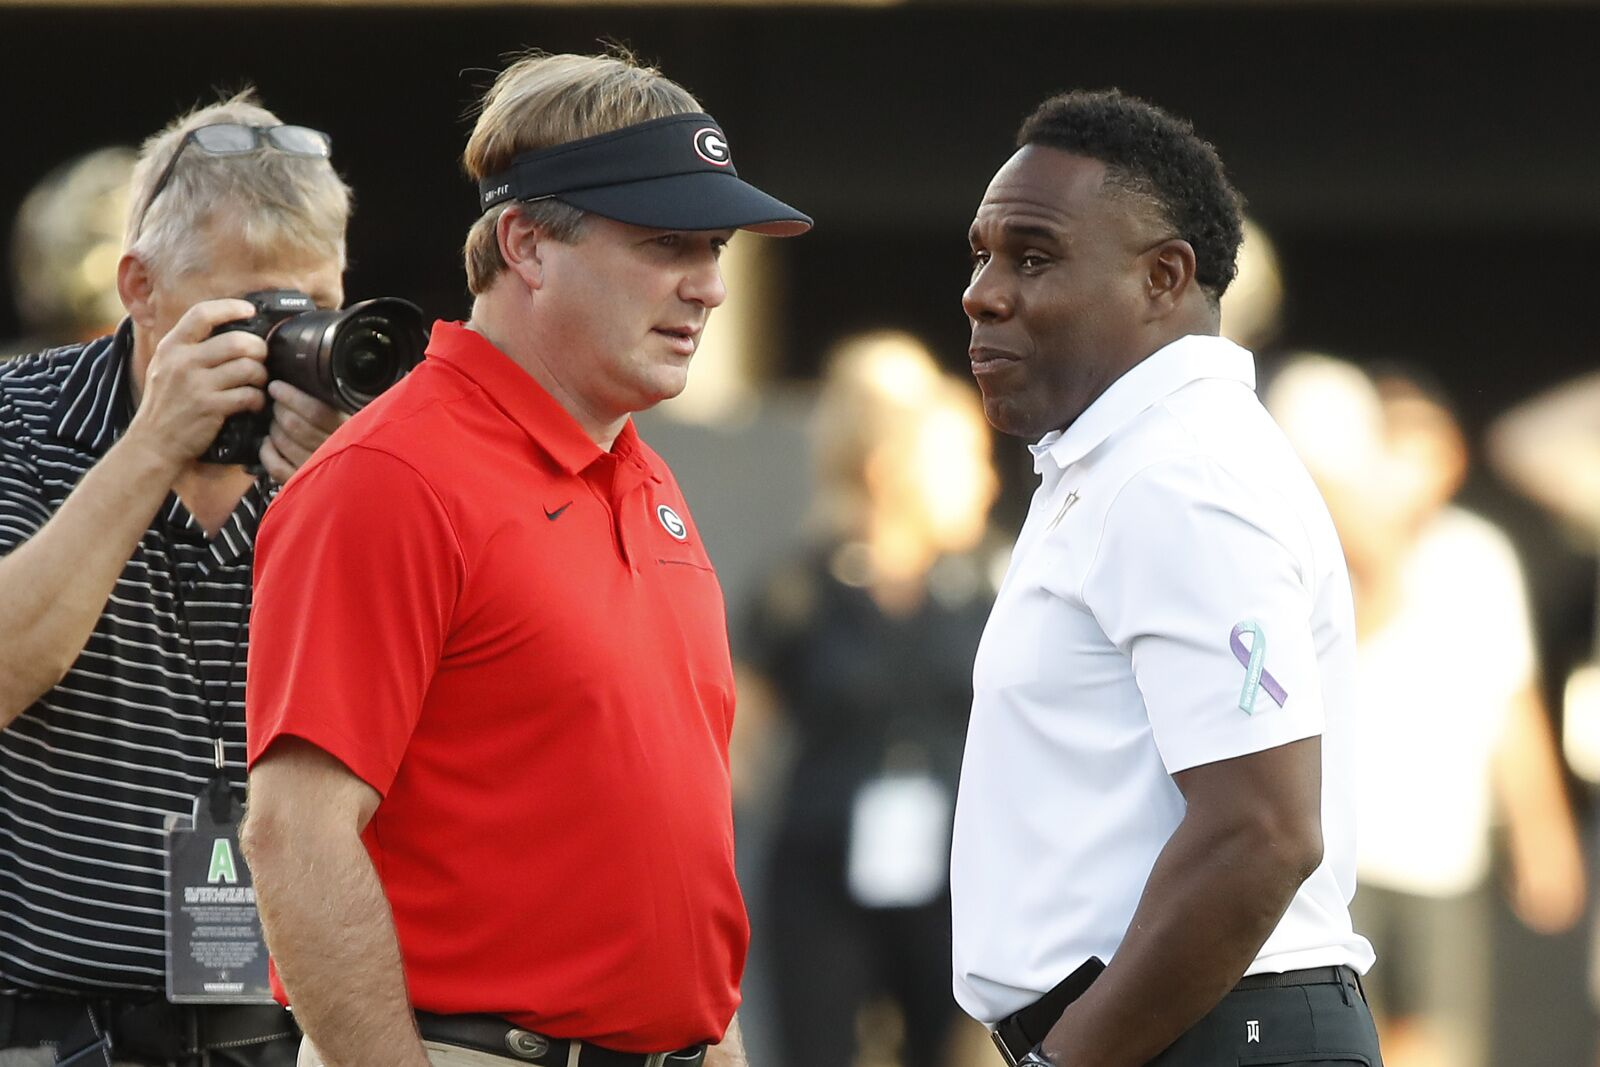 Georgia Football: 3 takeaways from SEC opener win over Vanderbilt